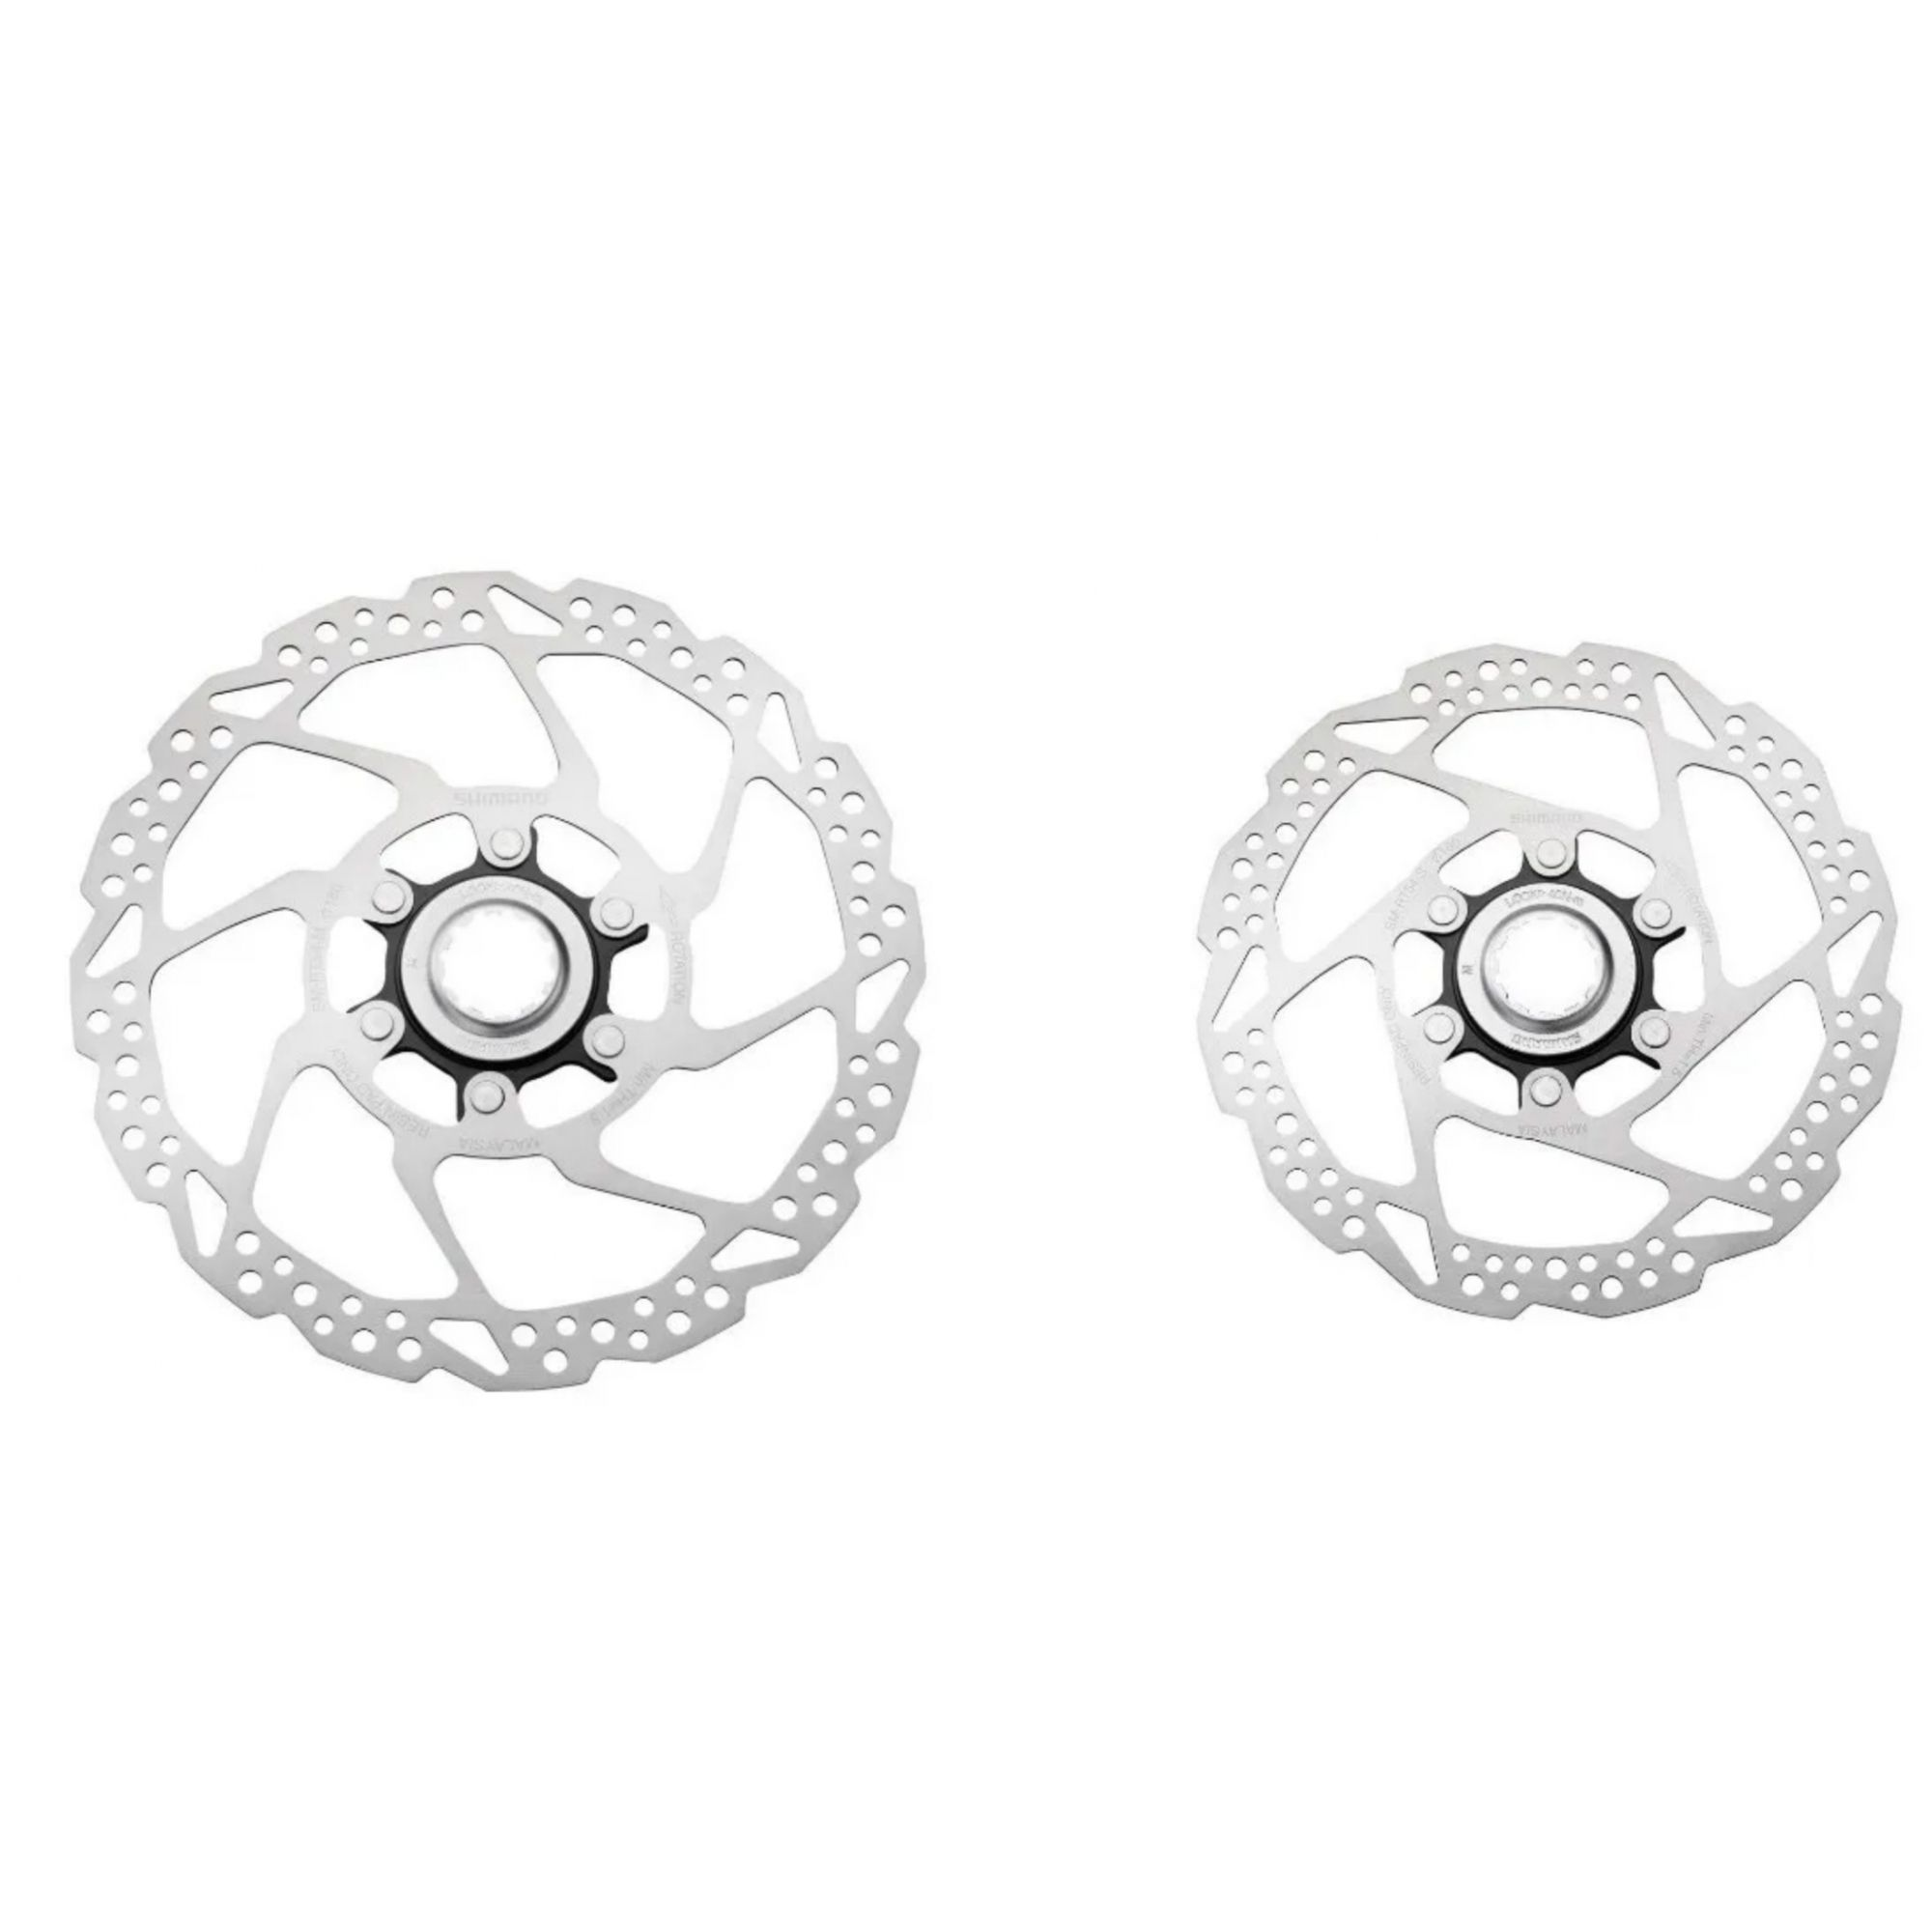 Par Disco Freio Rotor Shimano Rt54 160mm + 180mm Center Lock